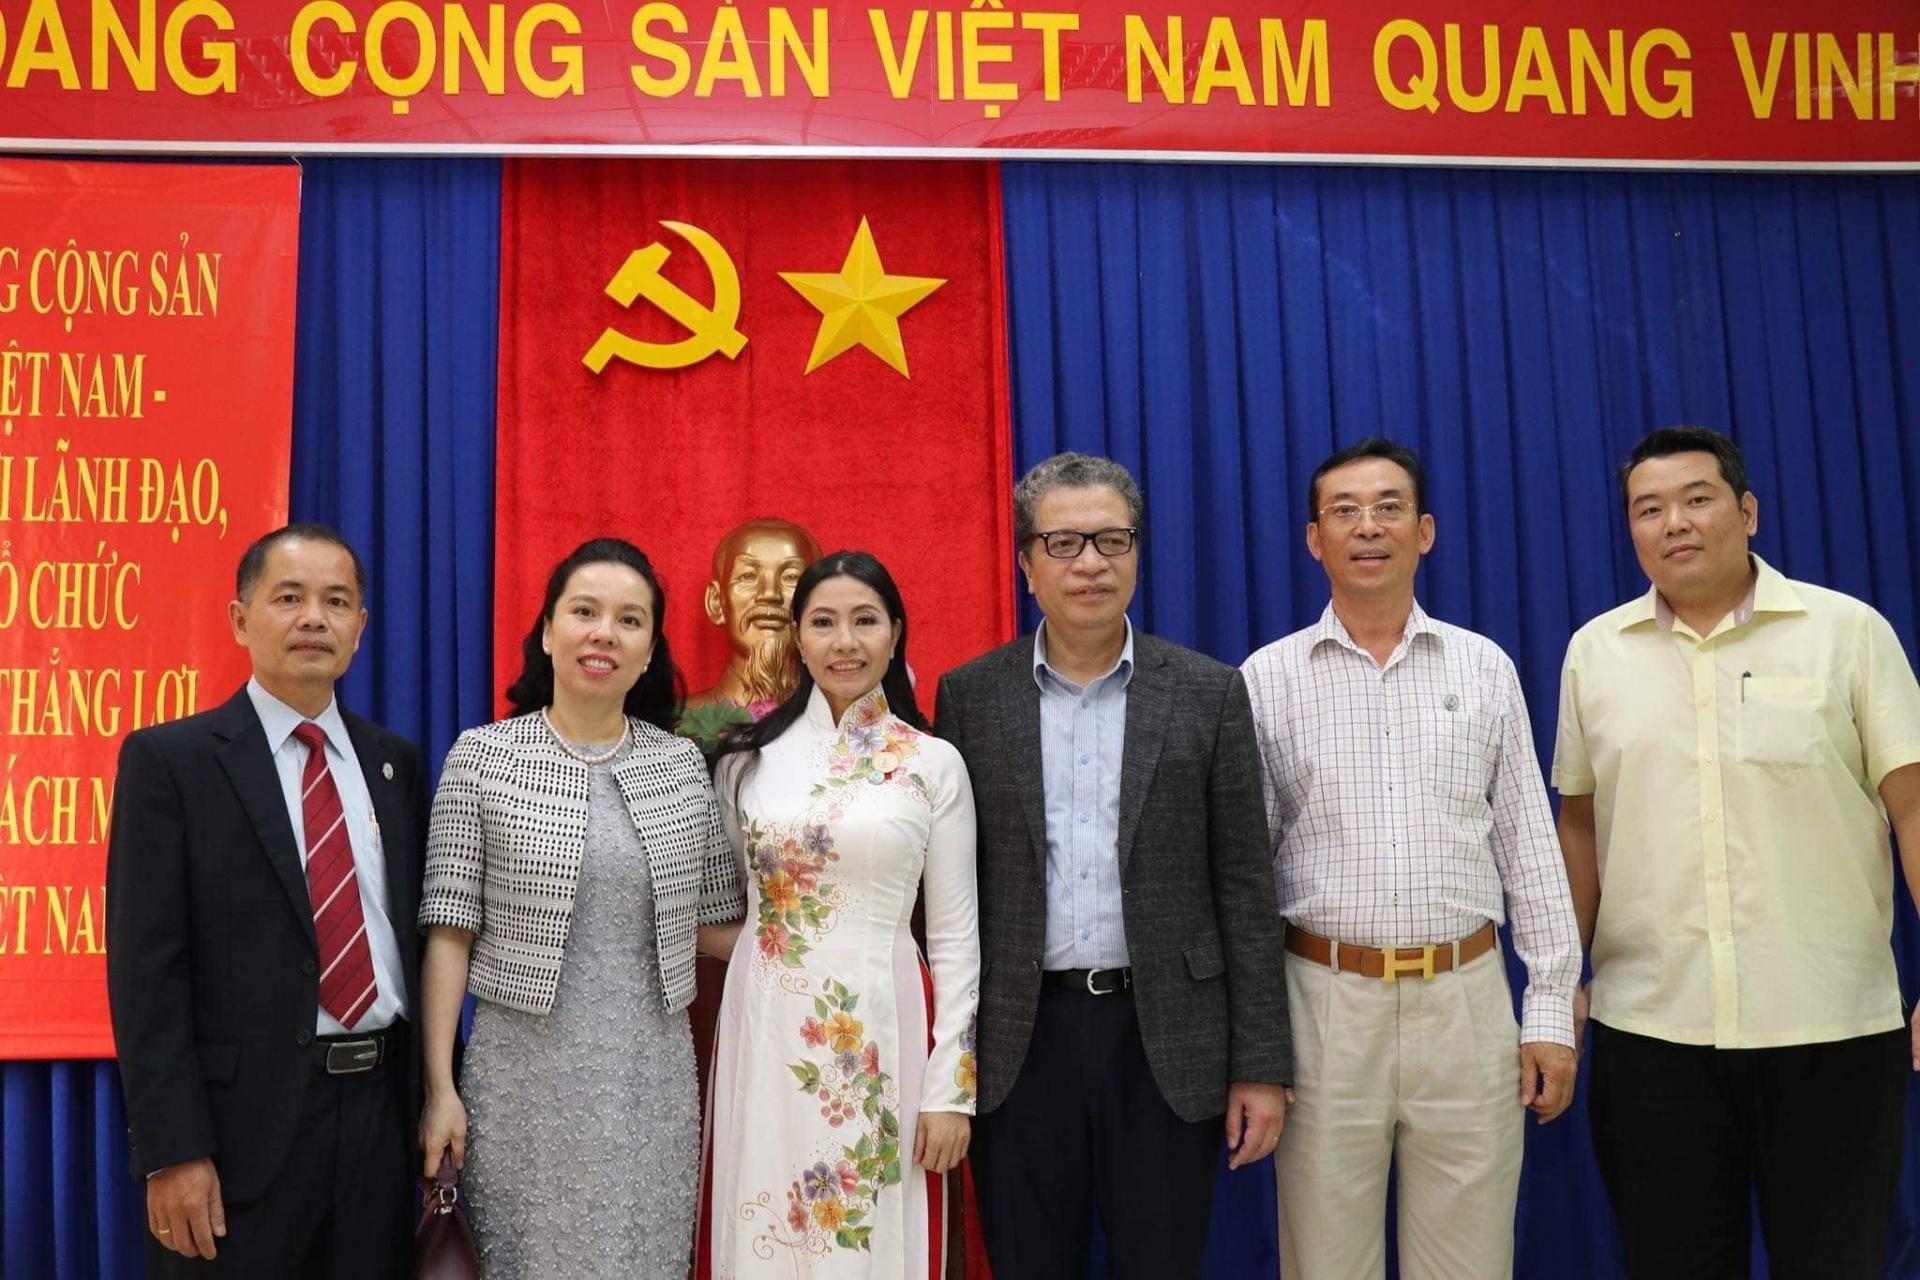 Overseas Vietnamese gather ahead of Lunar New Year